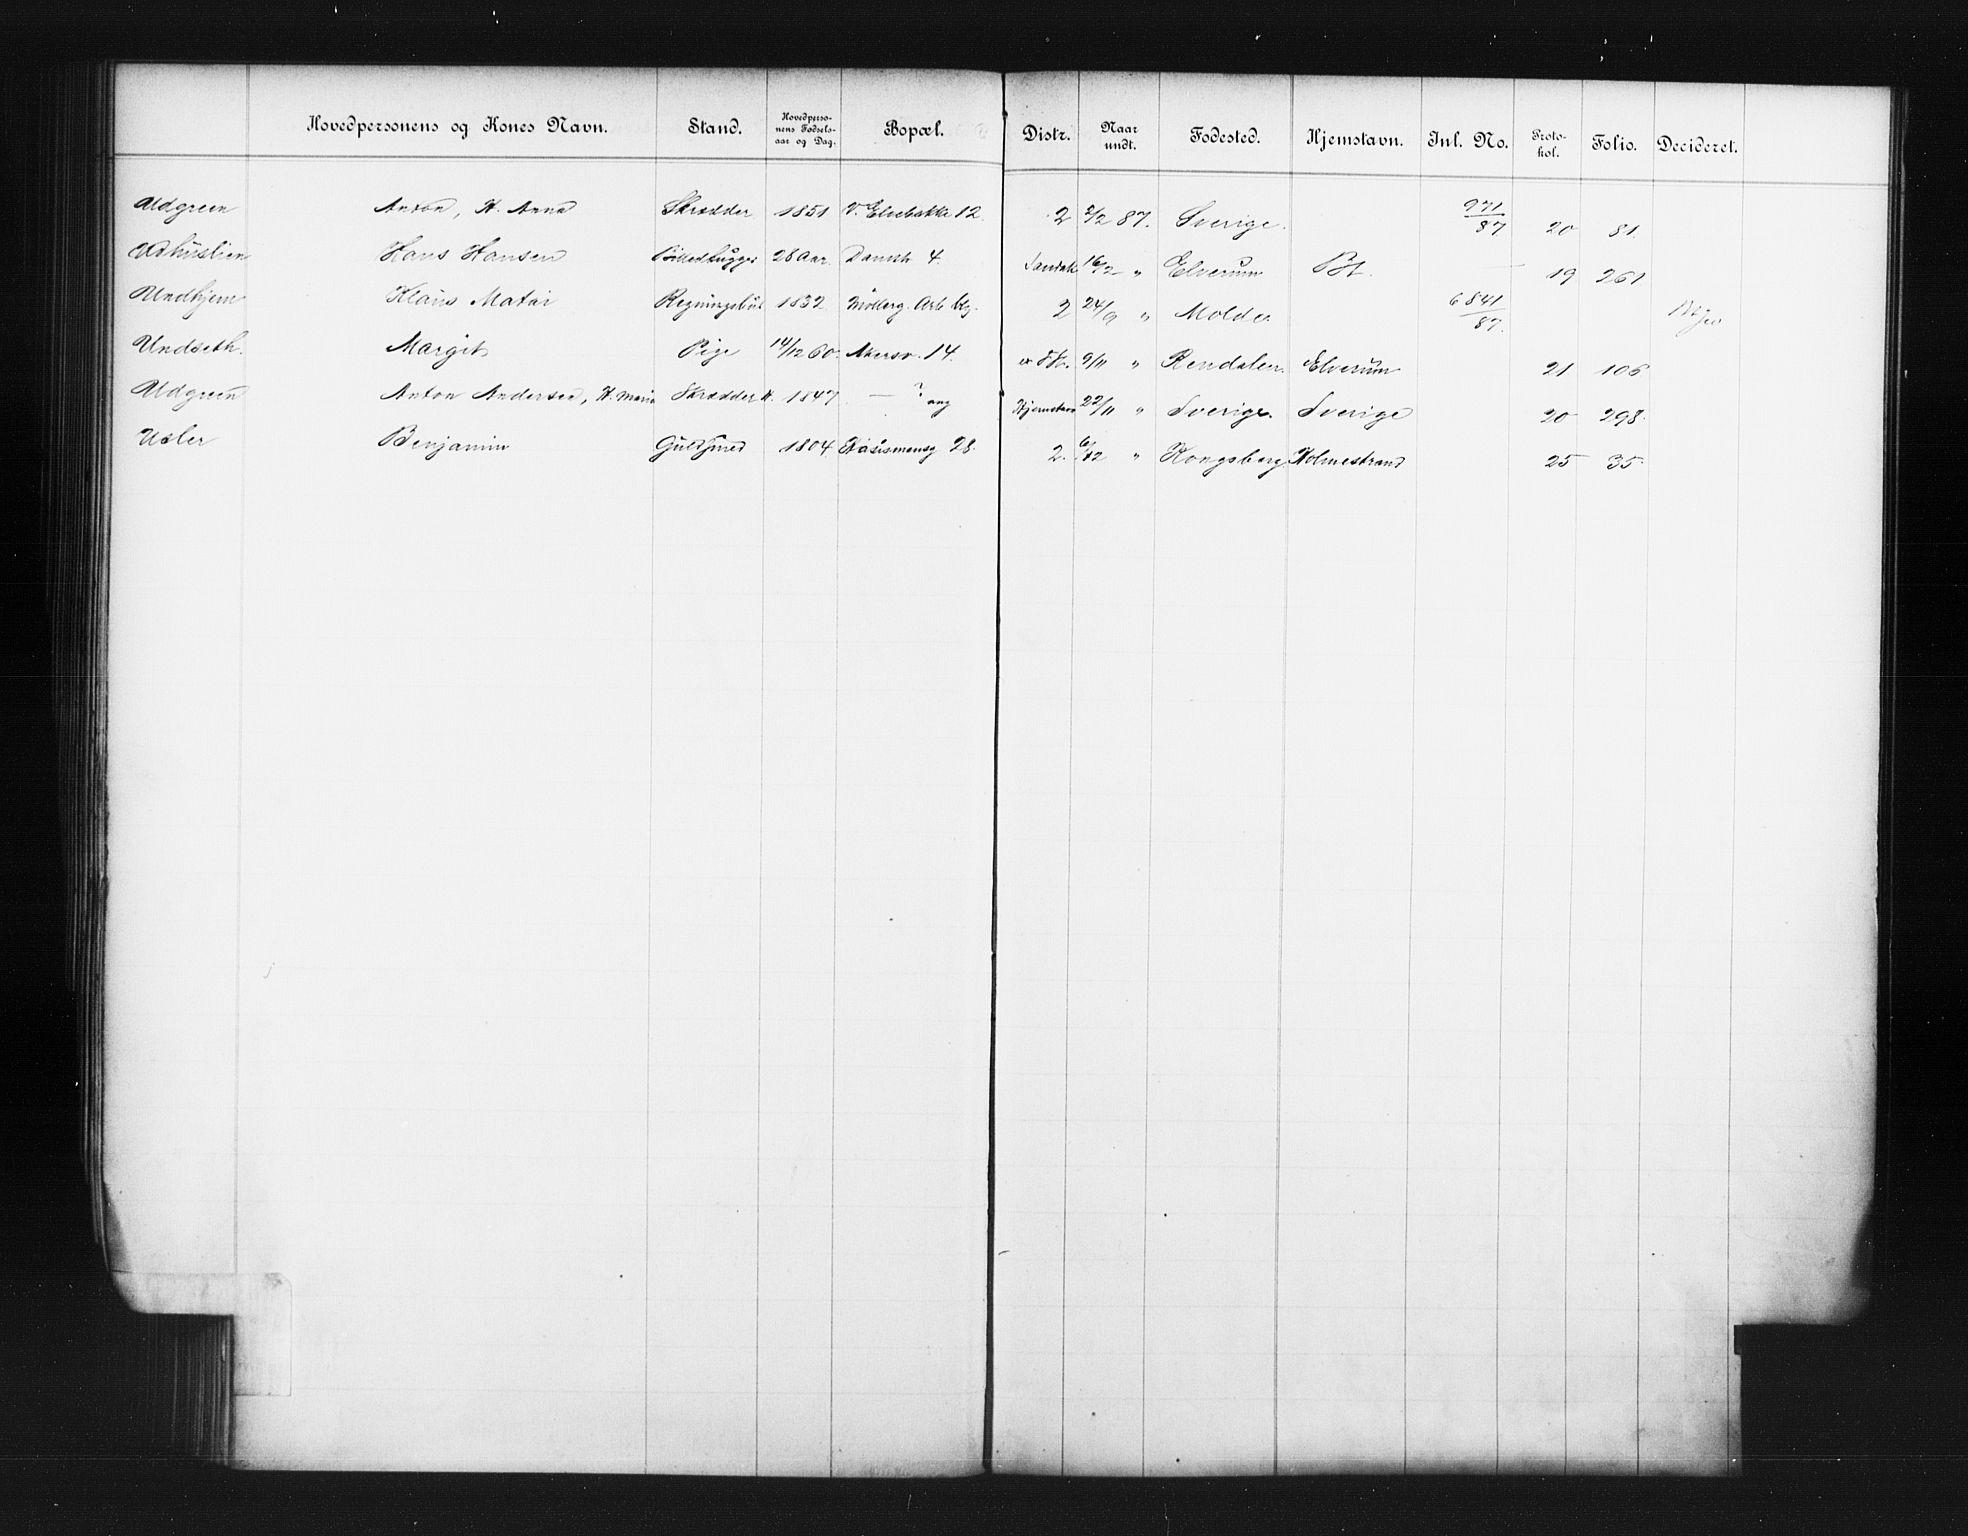 OBA, Fattigvesenet, Fb/L0007: Hjemstavnsregister, 1887, s. 191